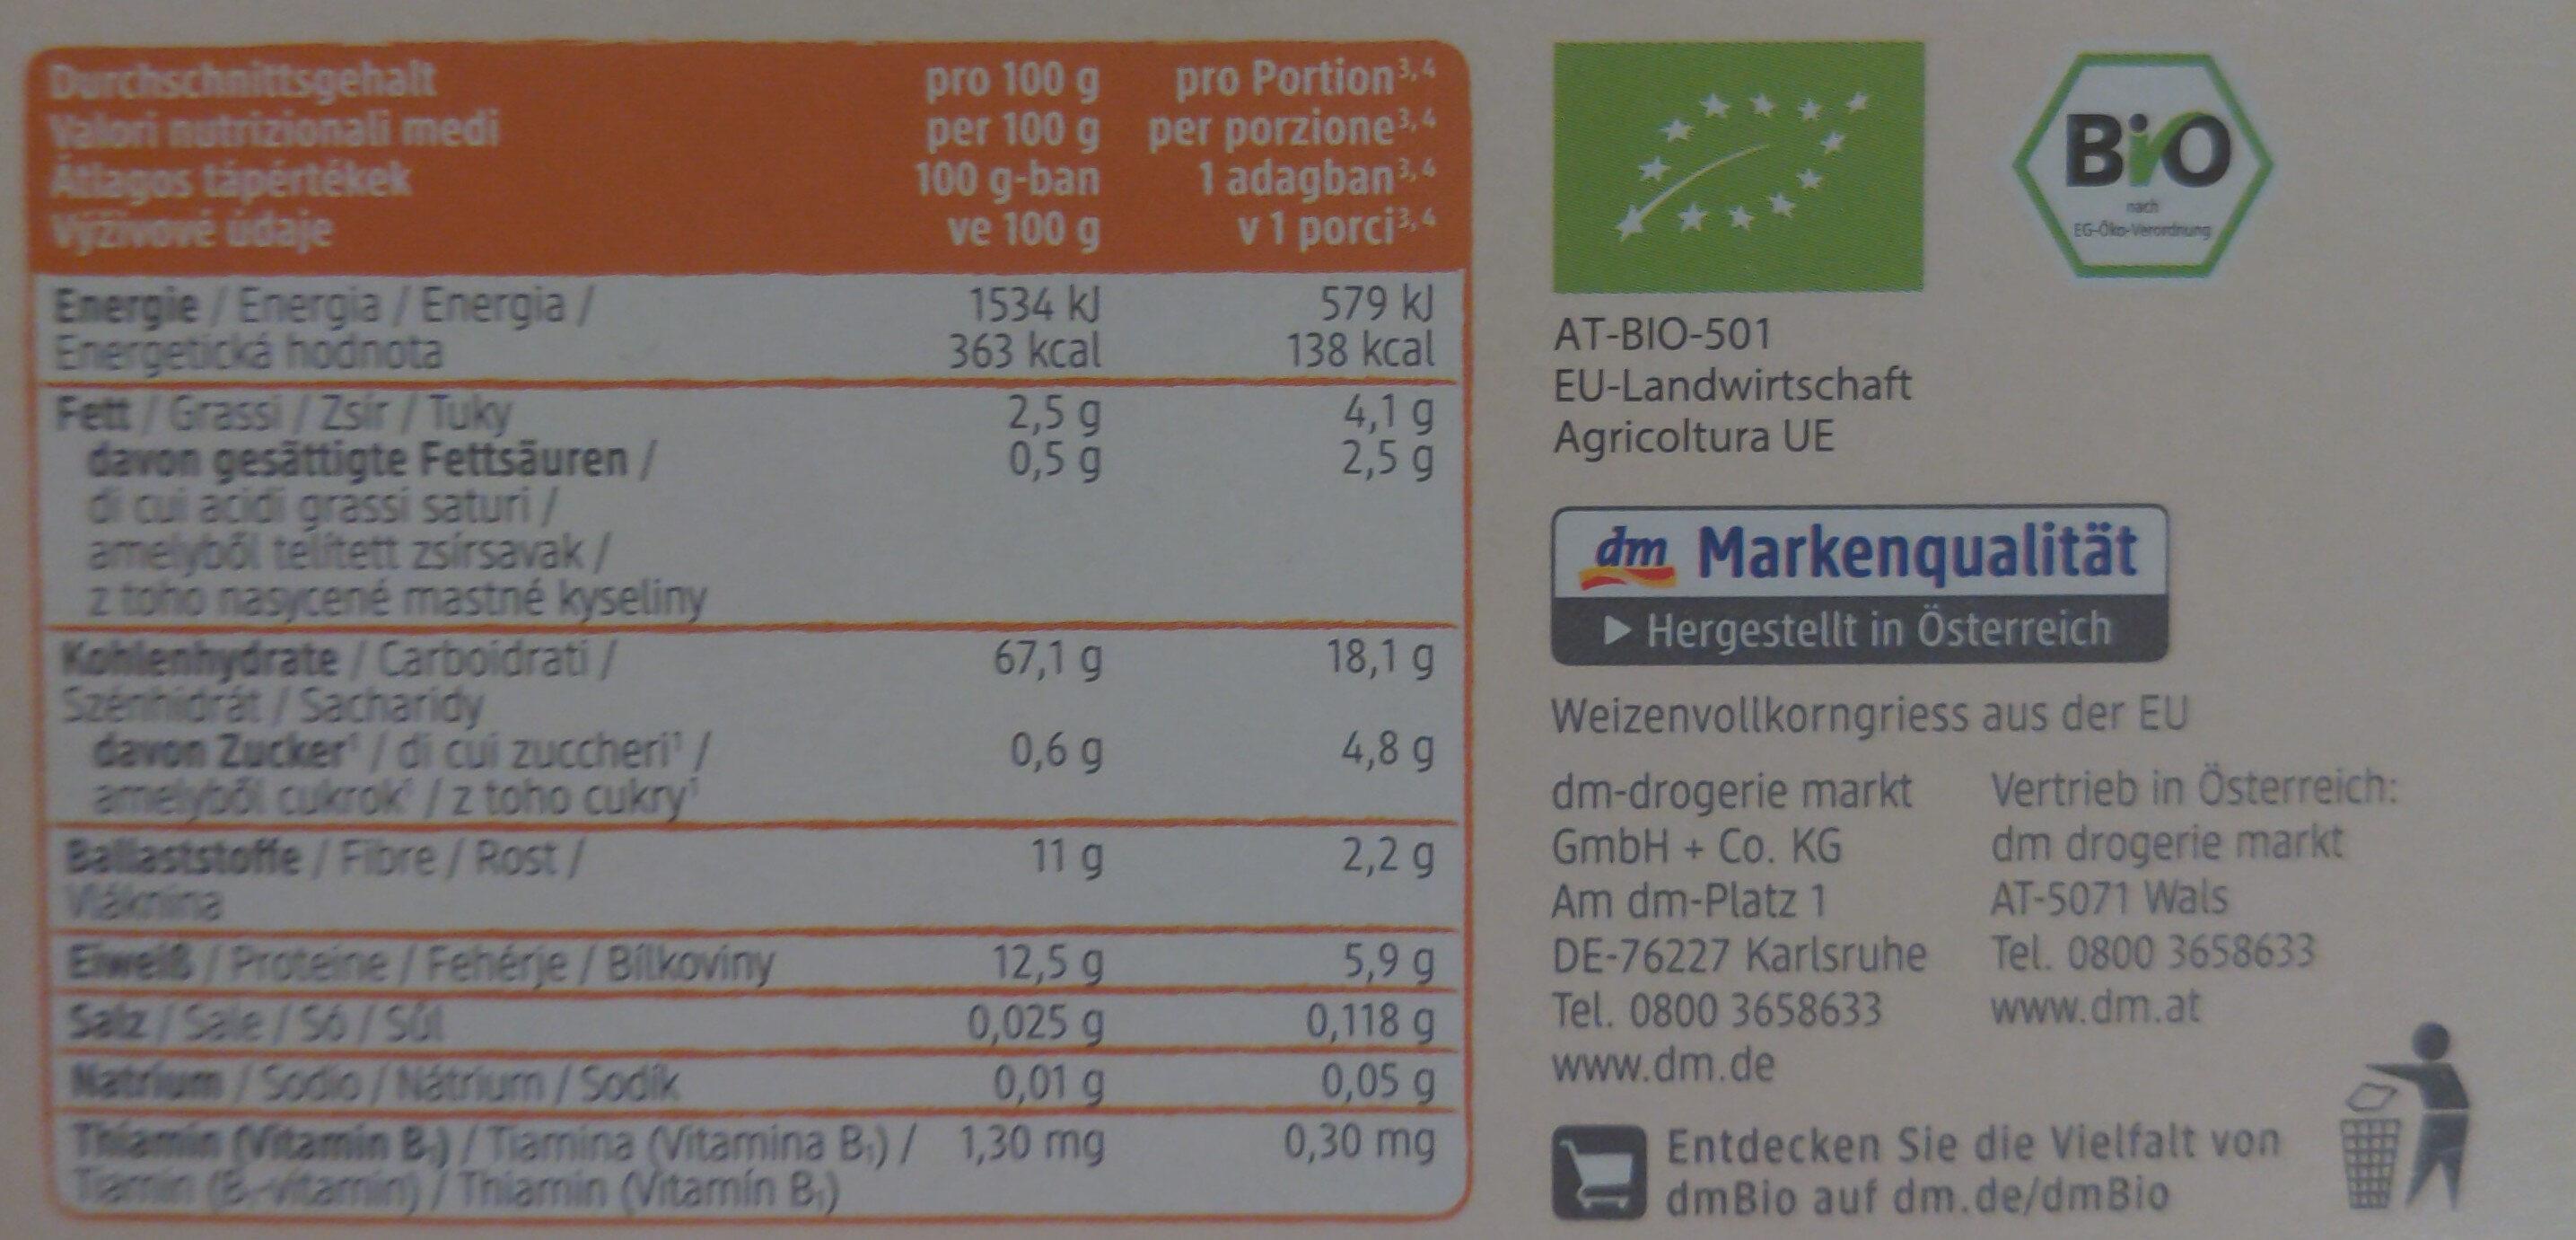 Grieß Getreidebrei - Nährwertangaben - de